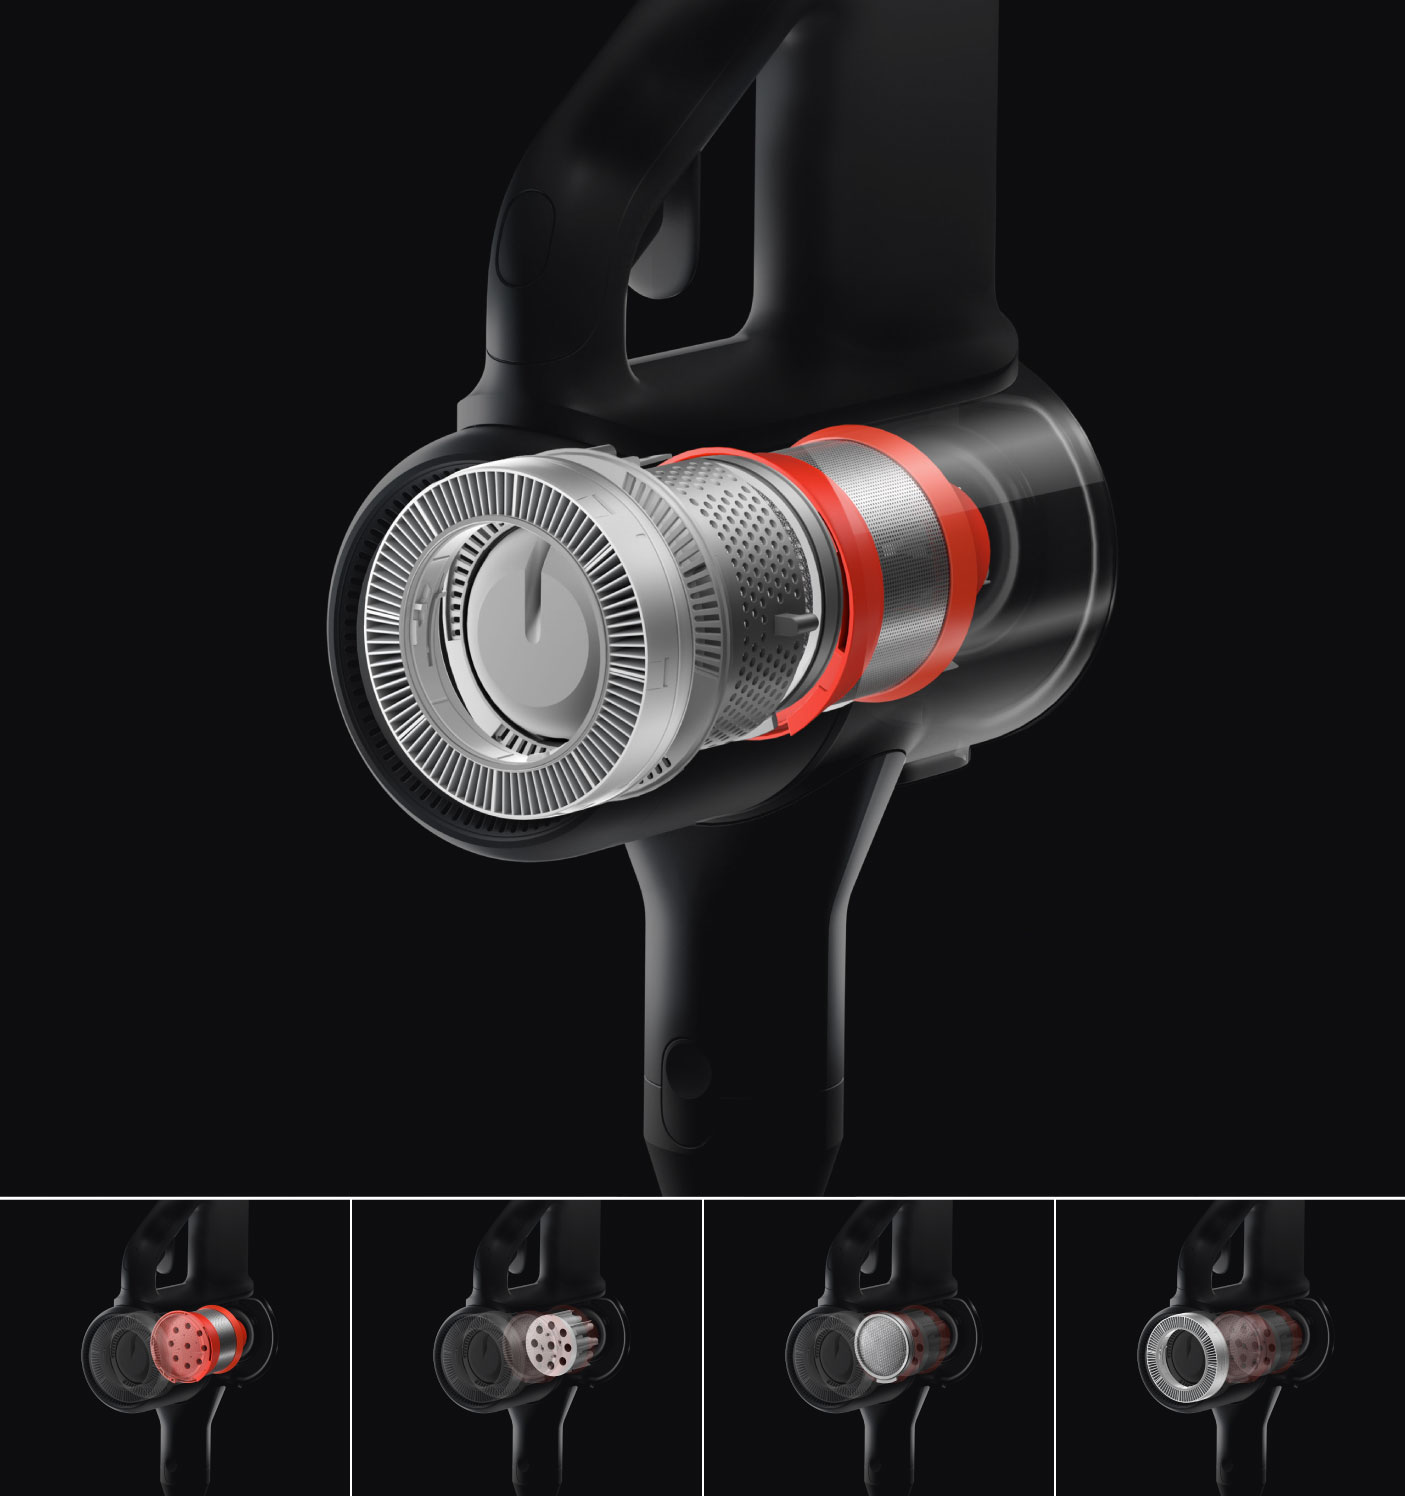 Xiaomi Mi Handheld Vacuum Cleaner pětistupňová filtrace